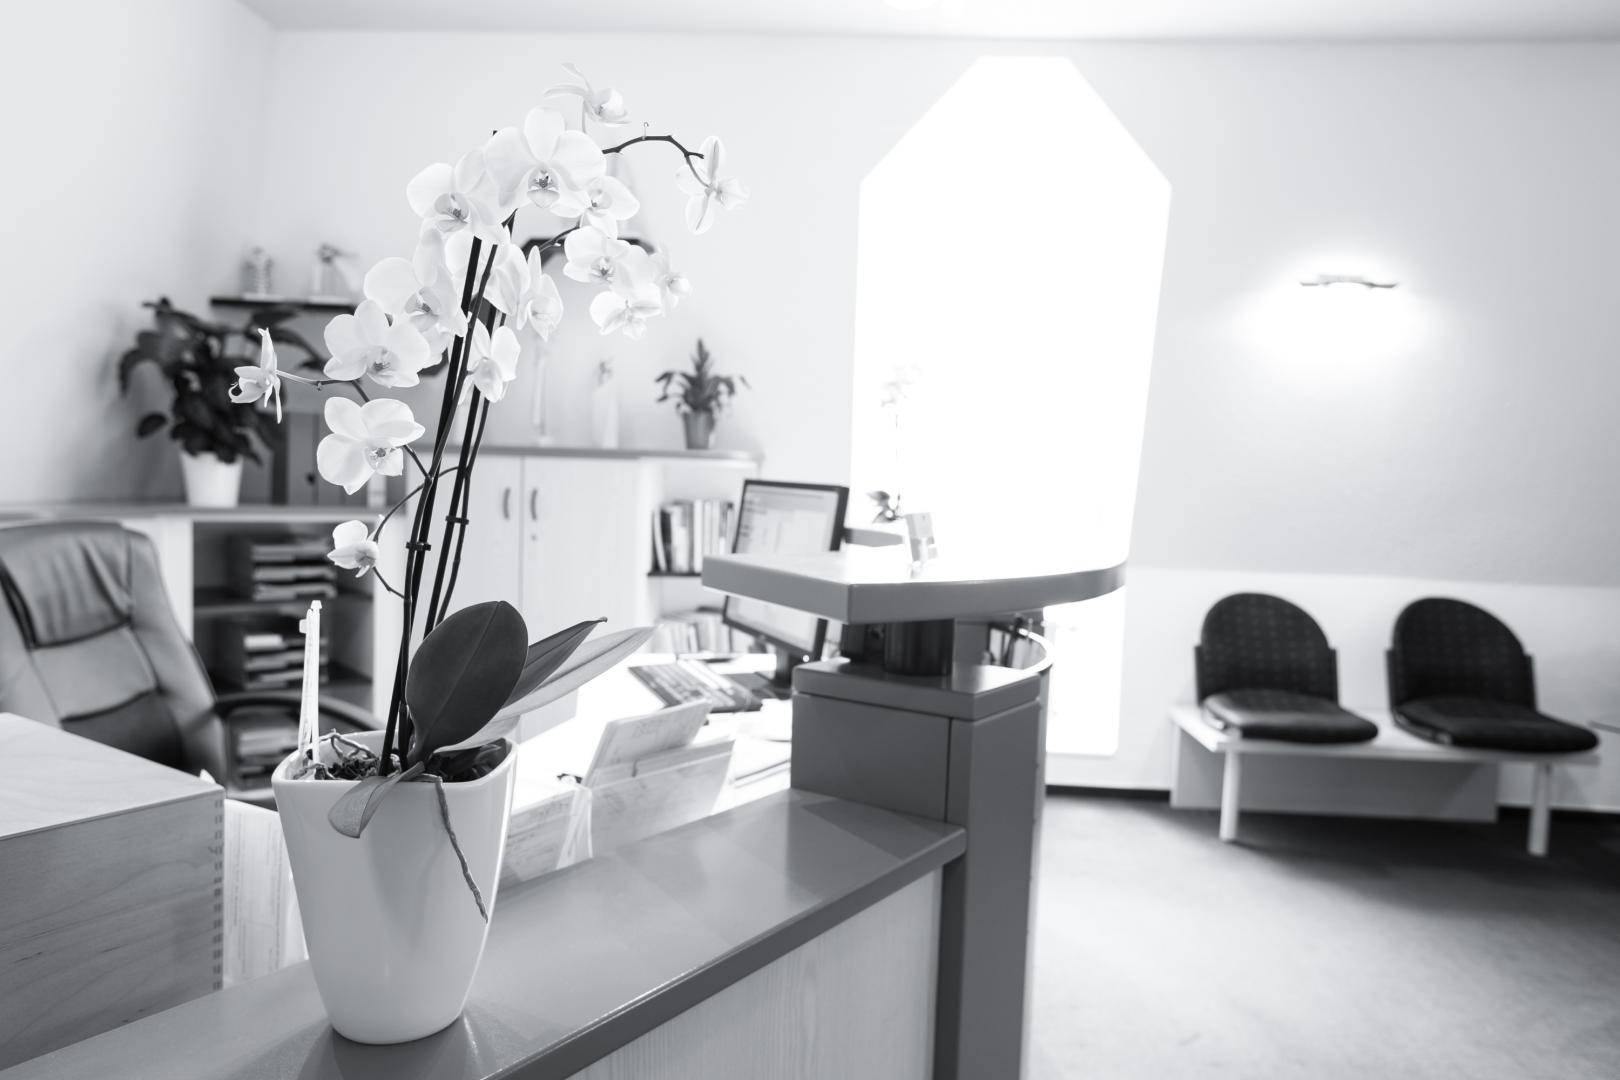 physiotherapiezentrum rostock – martin moratz-25